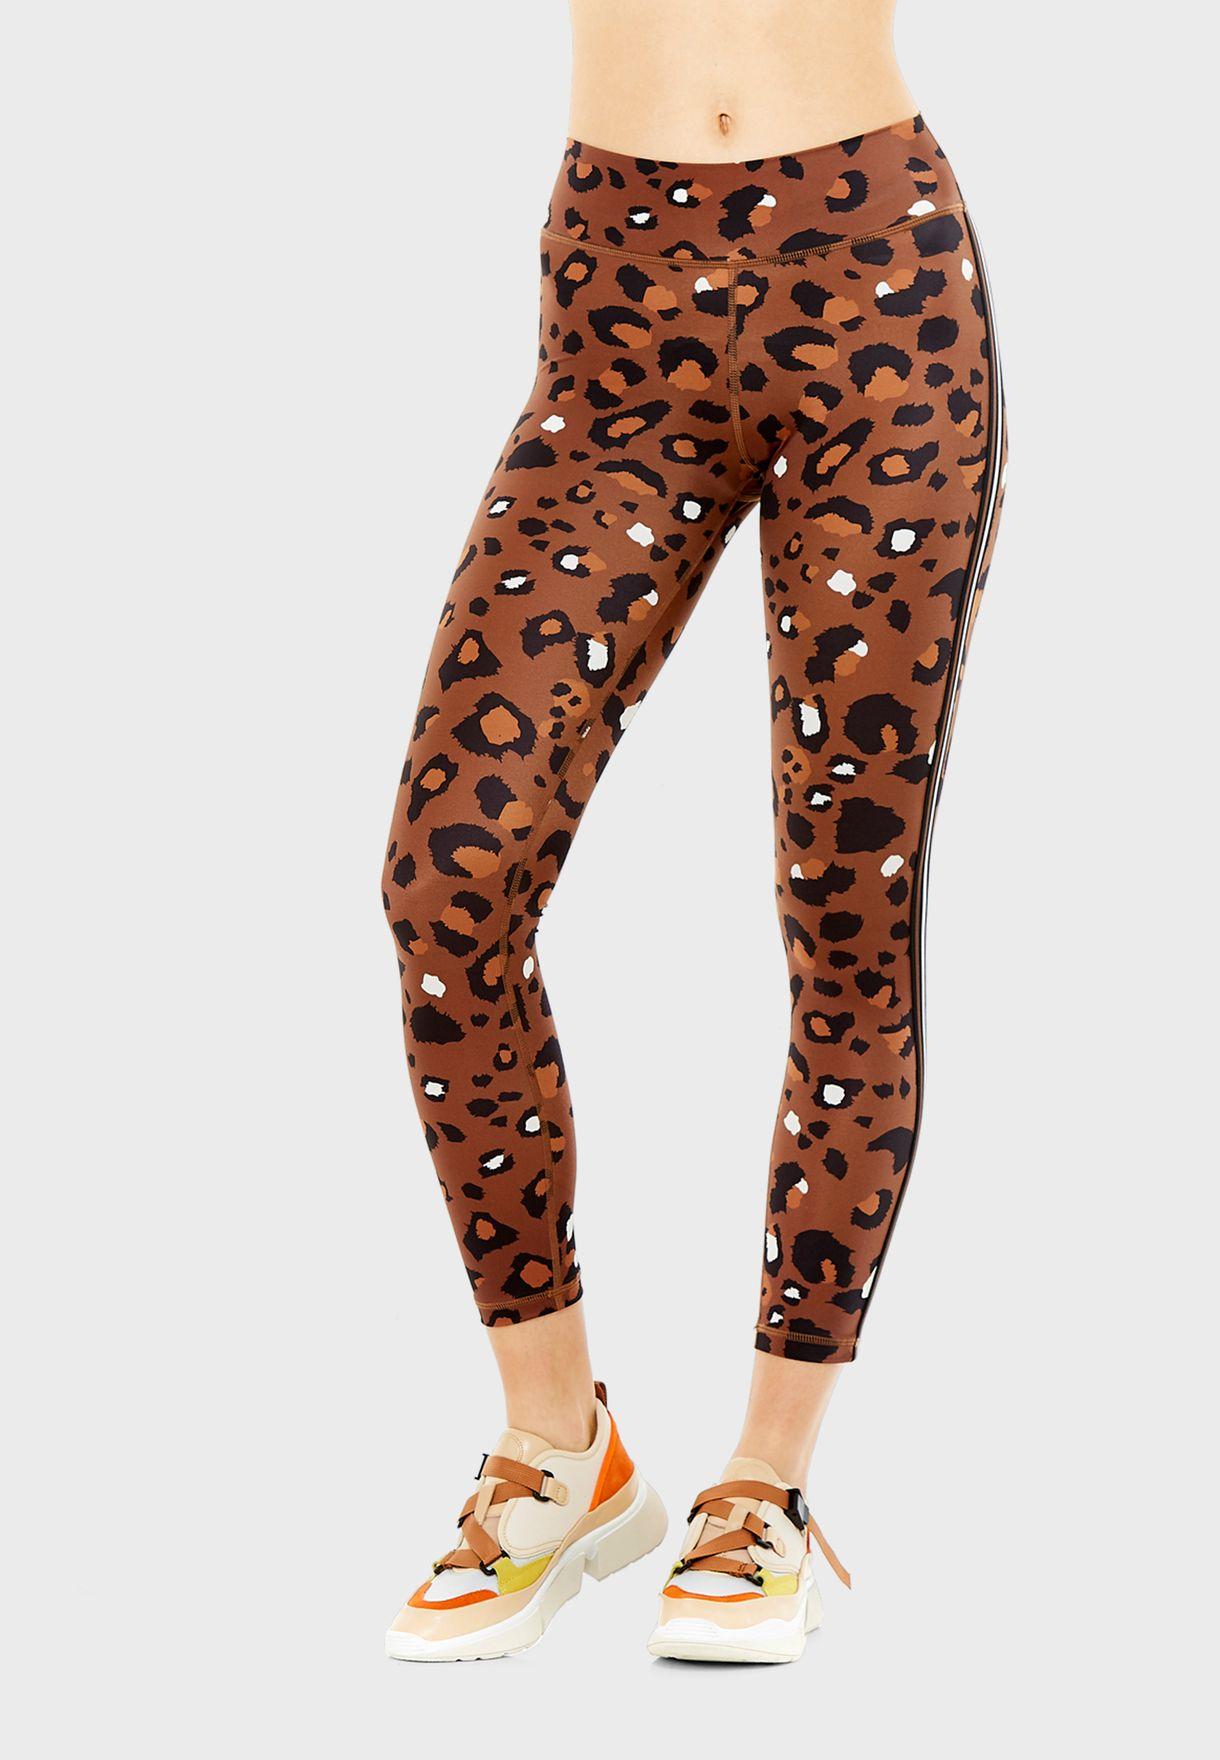 Tobacco Leopard Leggings